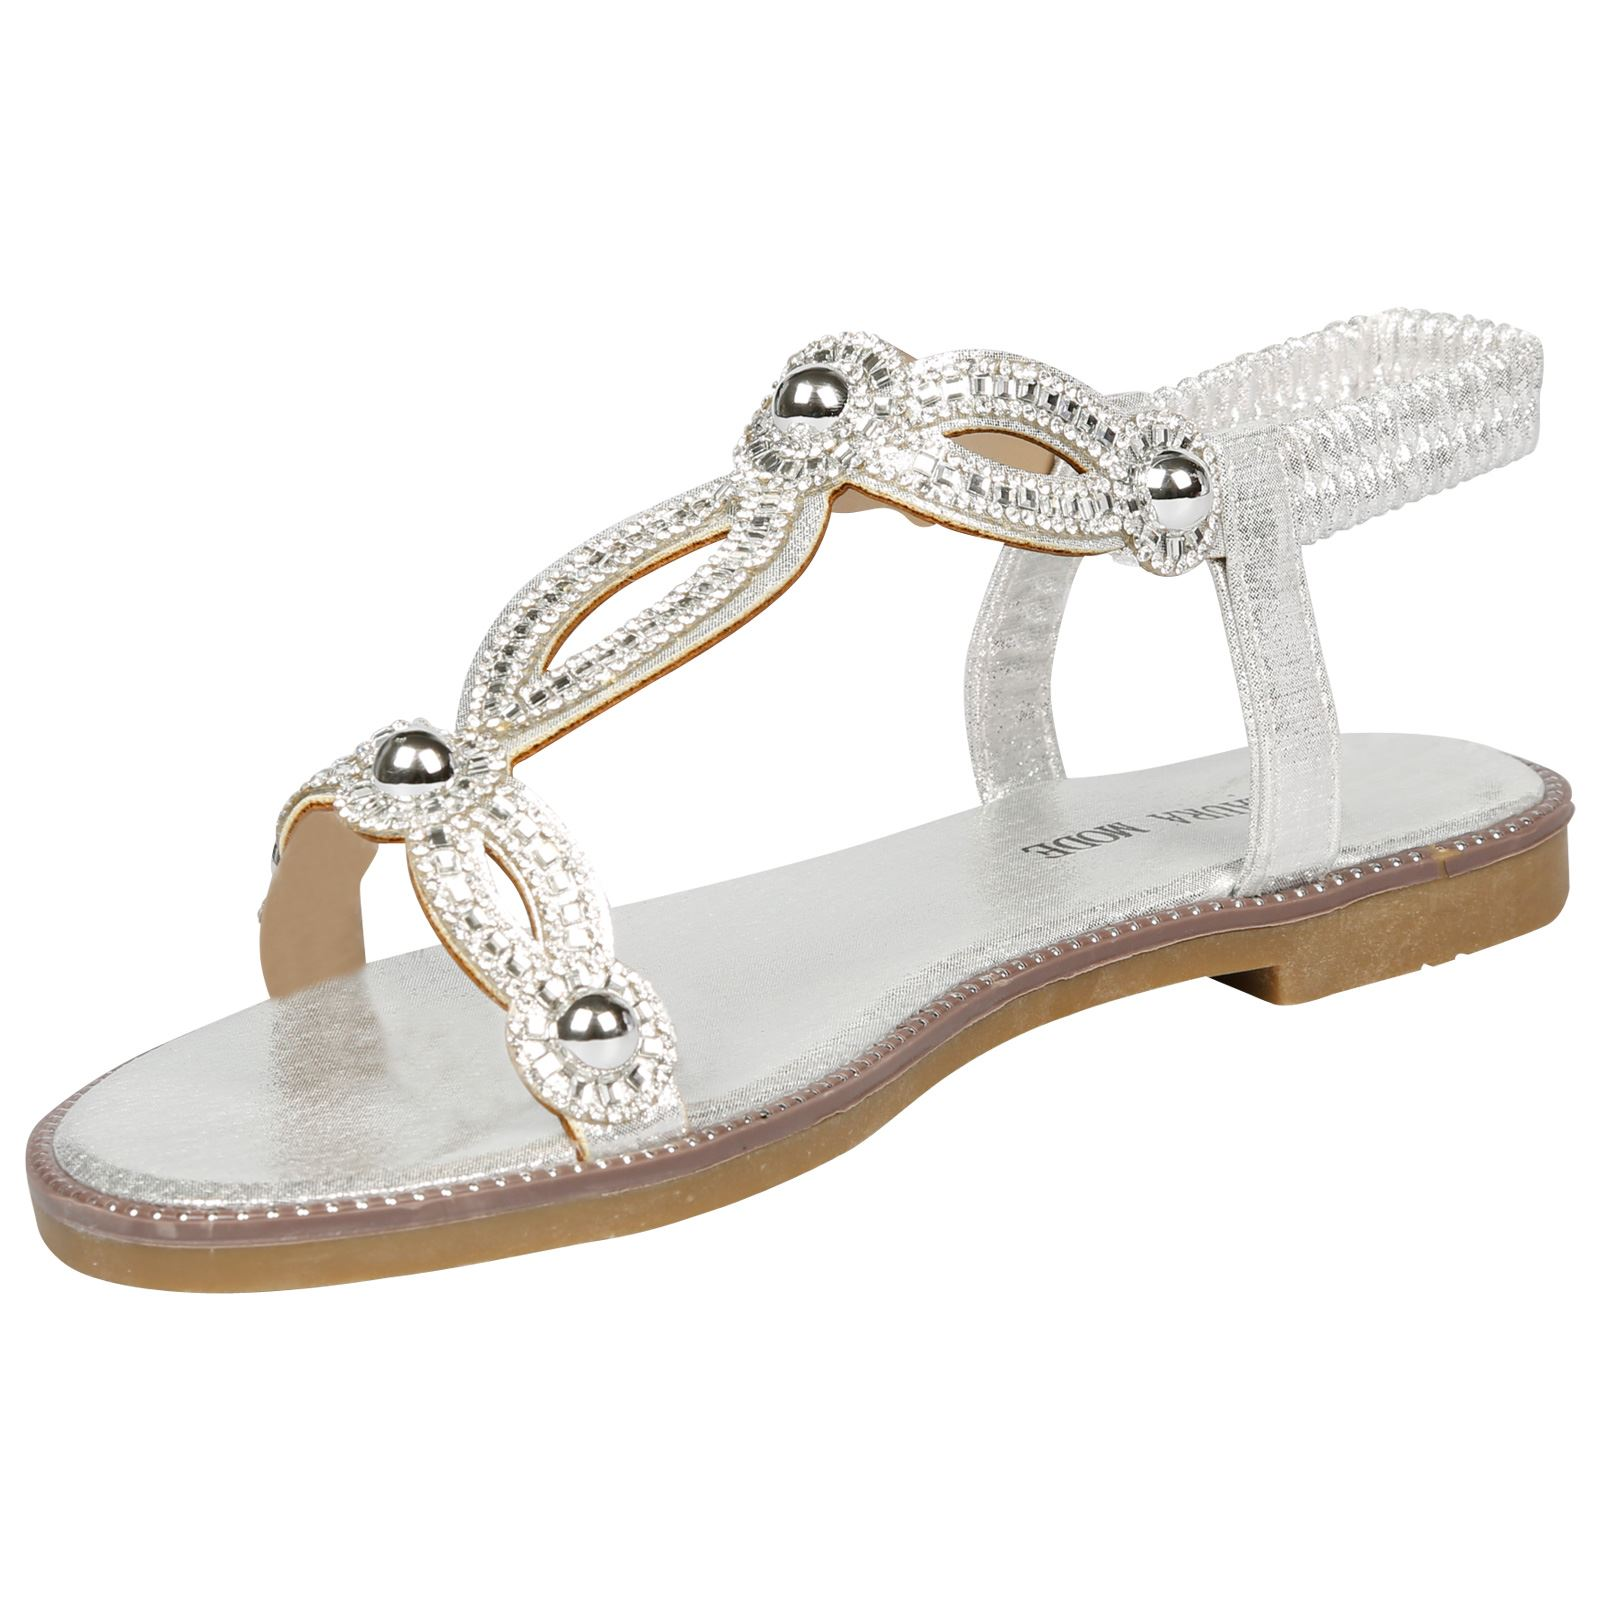 2bda5a177384 Elle Womens Flats Peep Toe Diamante Studded Sandals Ladies Summer ...